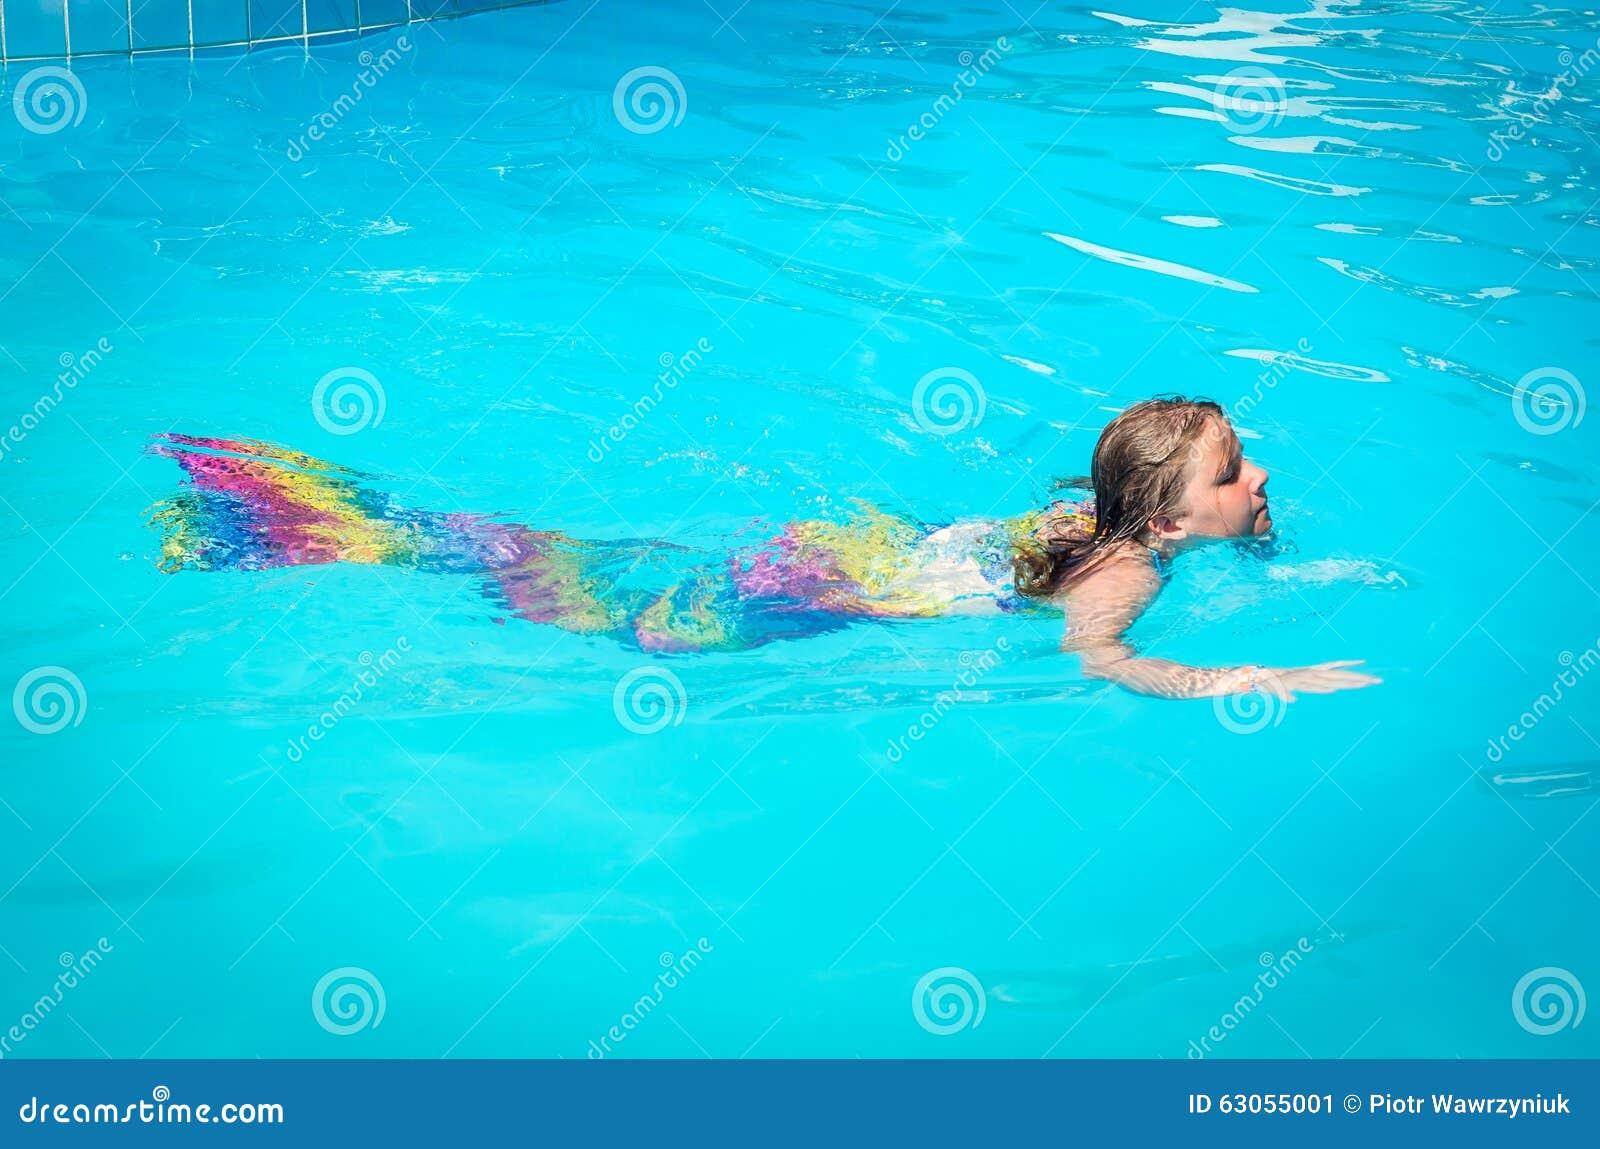 Mermaid Girl Swimming In The Pool Stock Photo Image 63055001